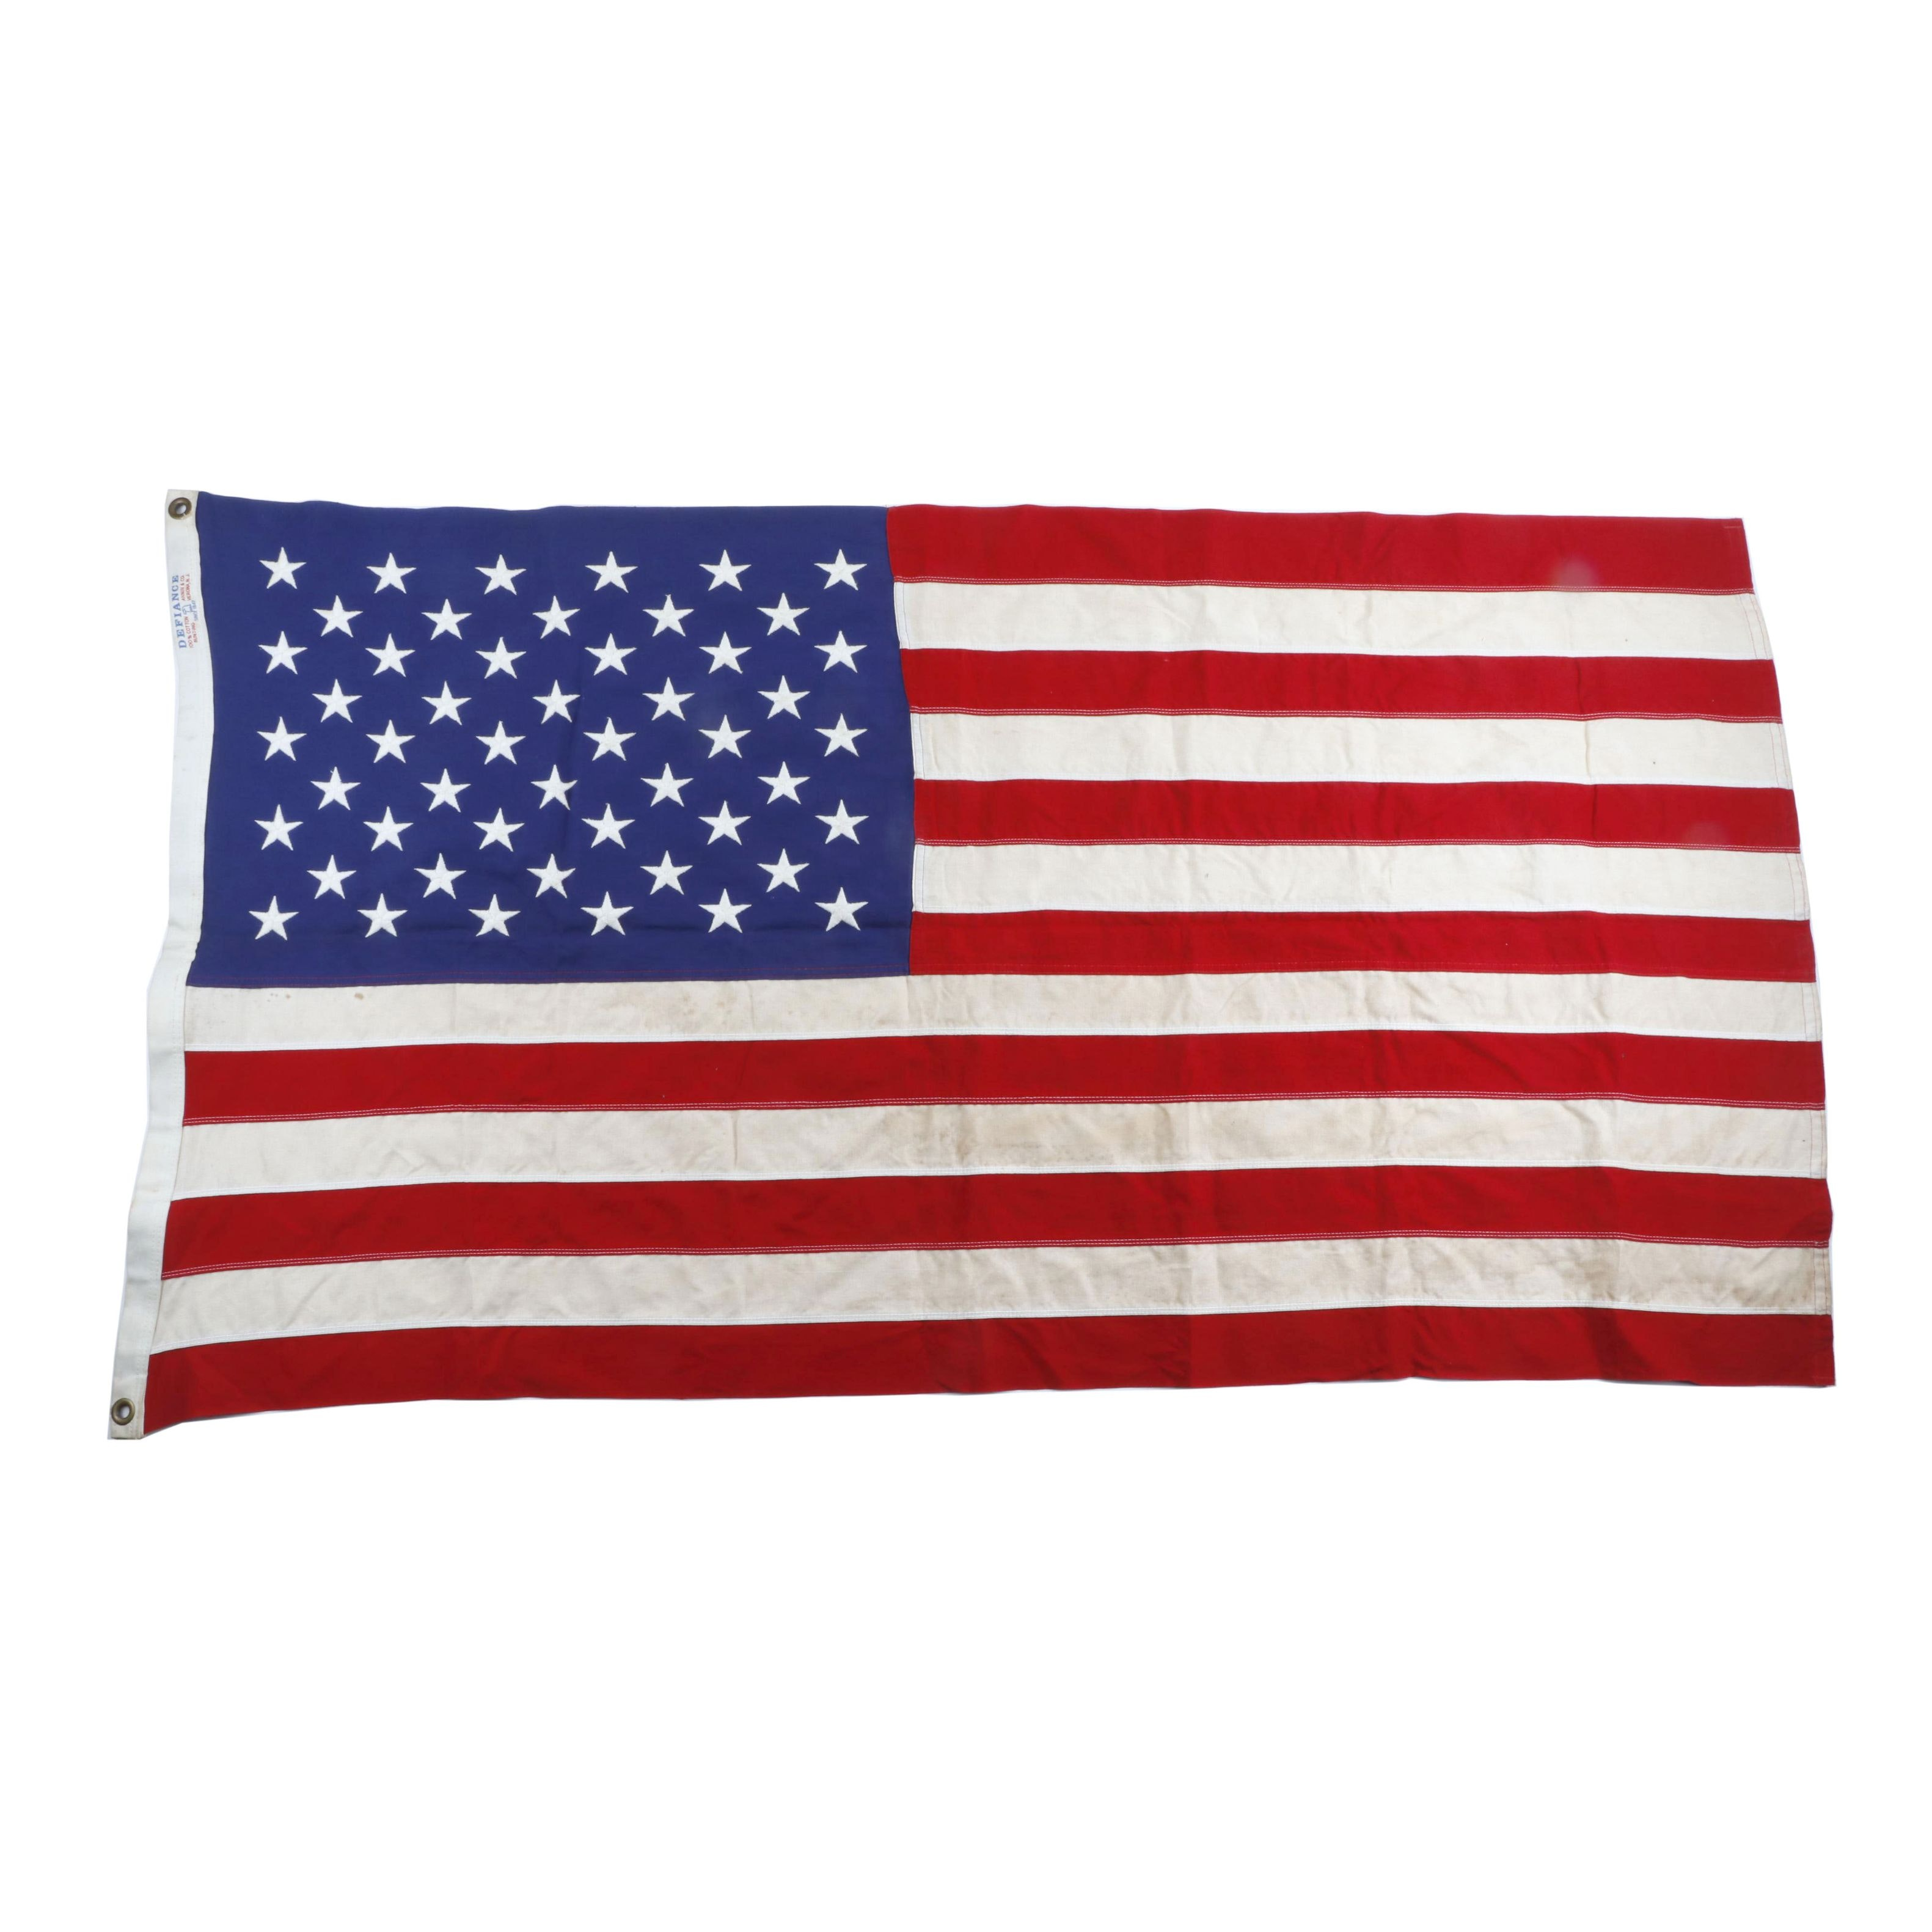 Vintage Annin Flagmakers 50 Star American Flag